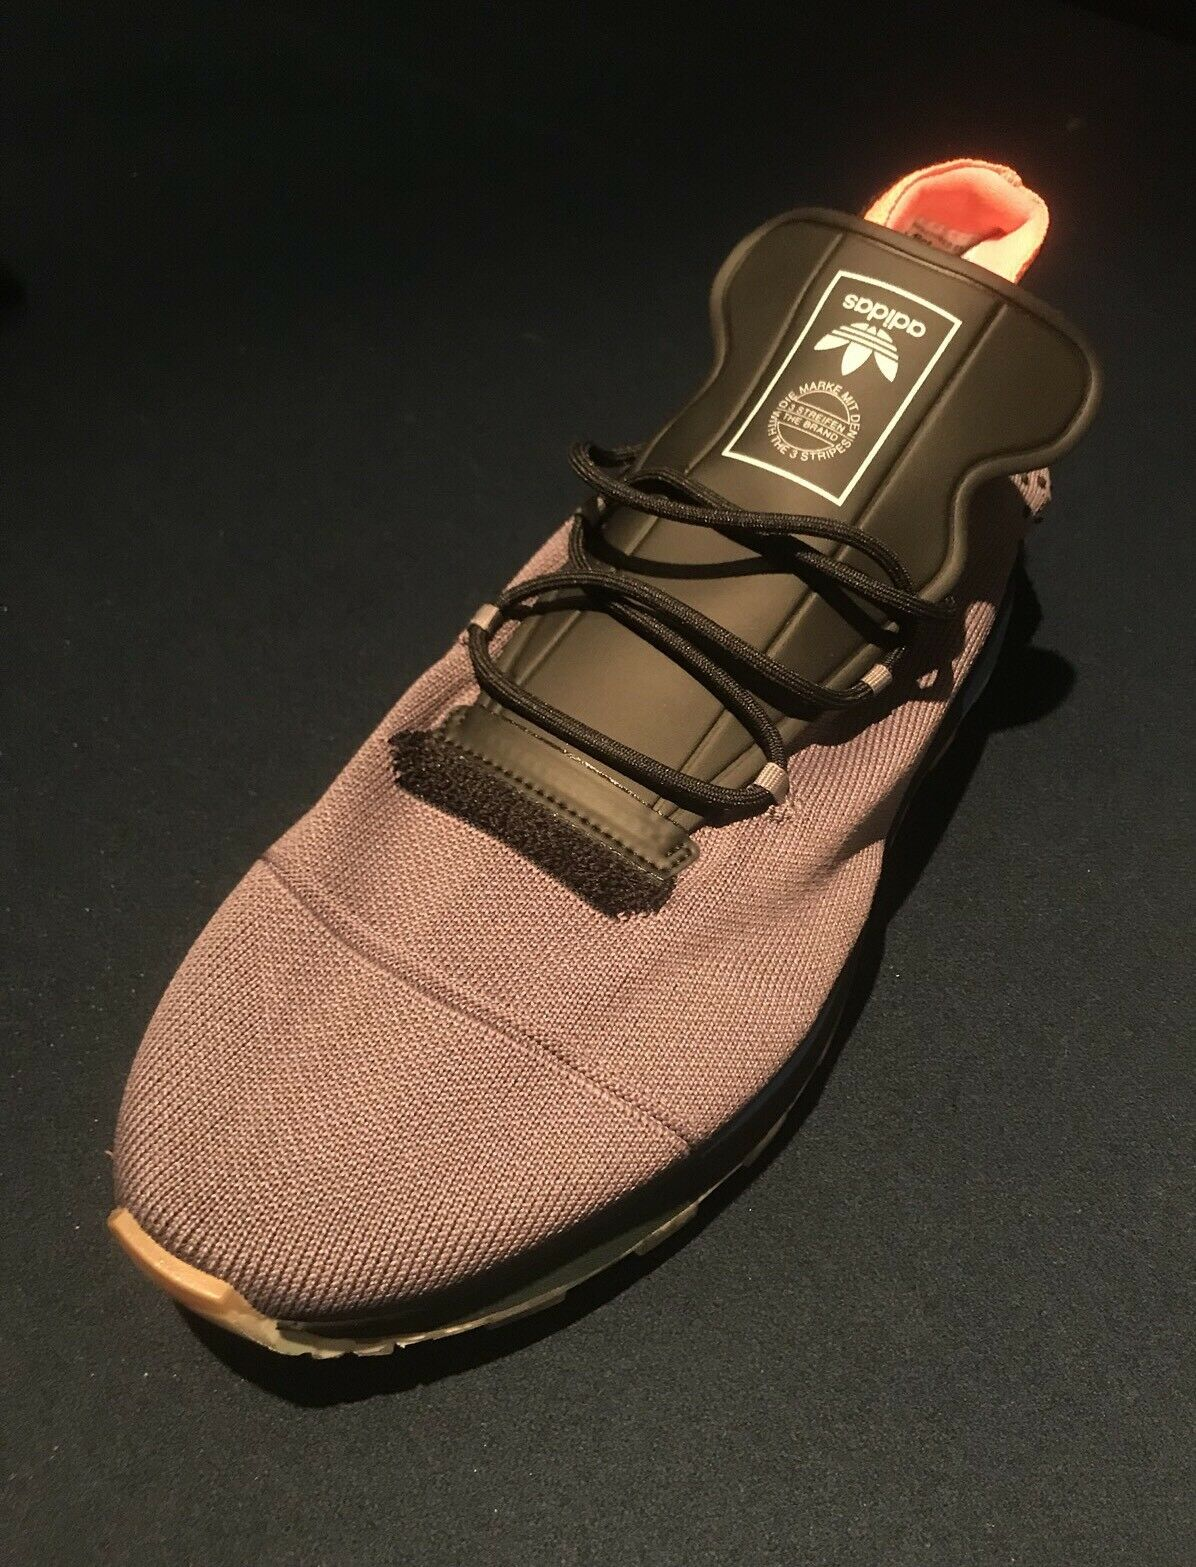 Adidas Alexander Wang AW Run Mid Shoes St Crag Grey Brand New Comfortable